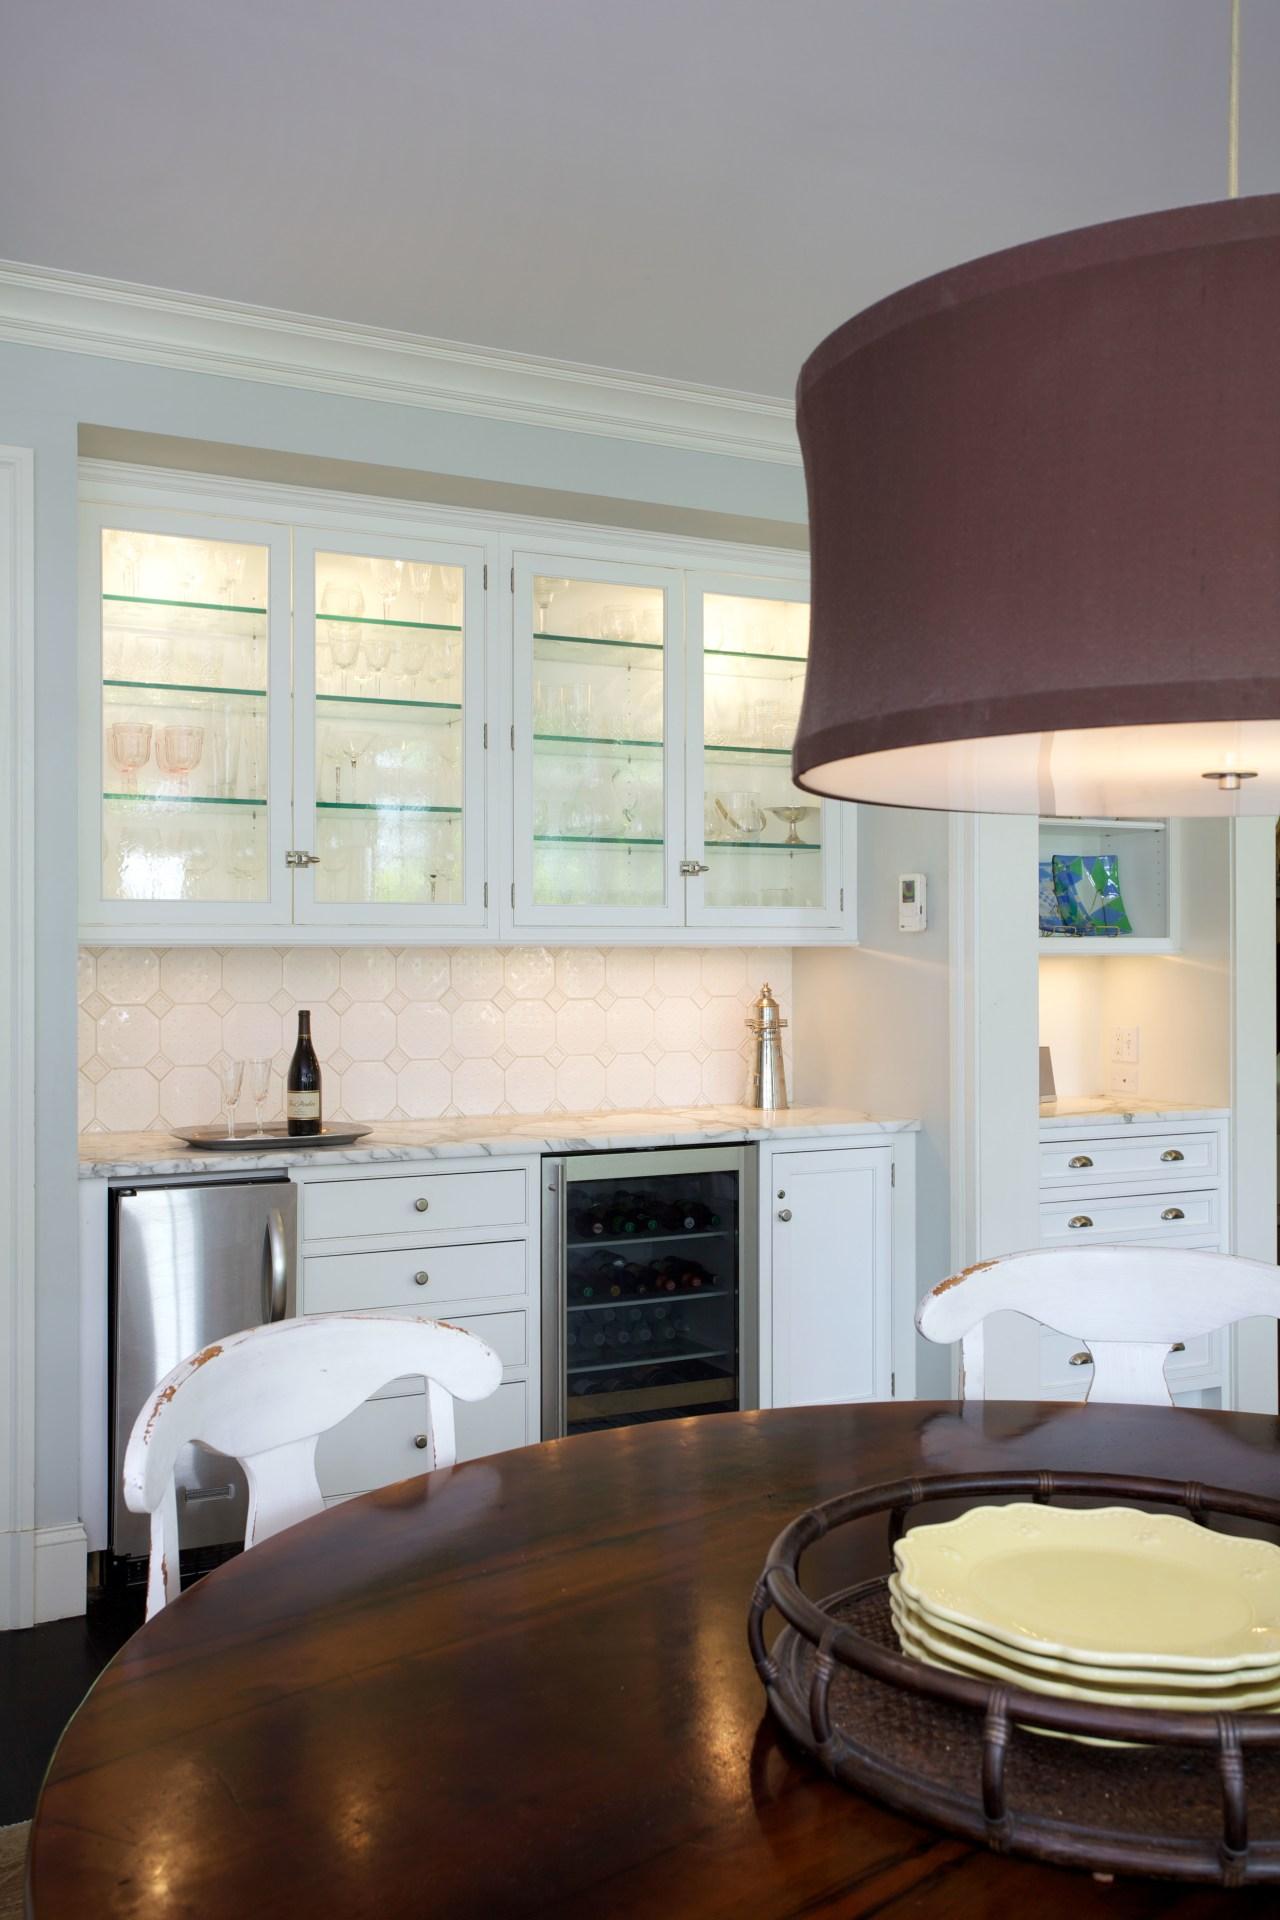 This breakfast area adjacent to the kitchen includes cabinetry, countertop, cuisine classique, floor, home, interior design, kitchen, living room, room, window, gray